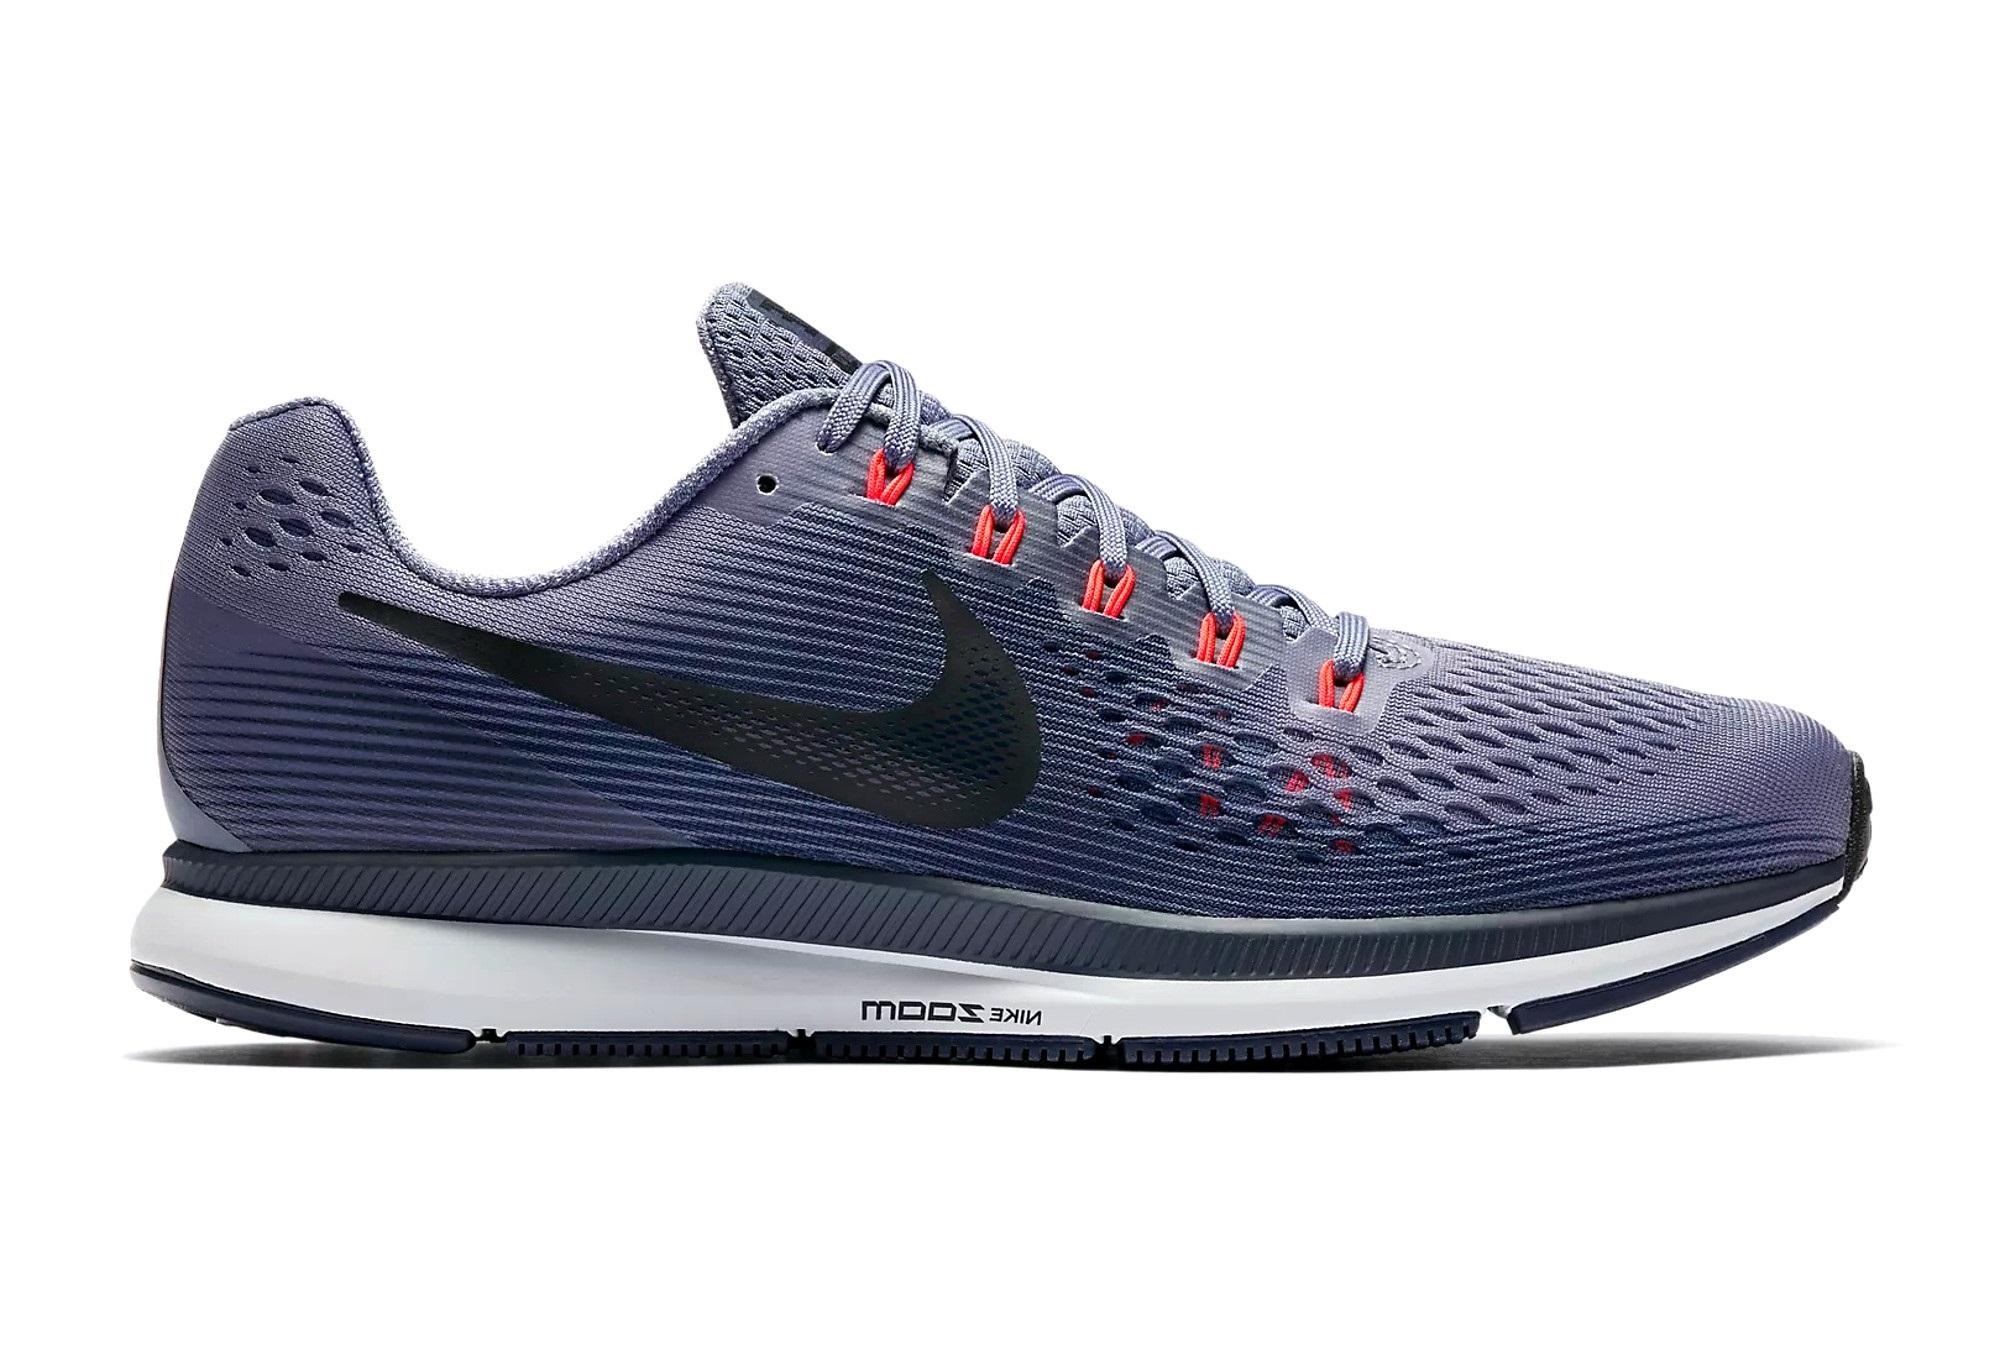 13eda51bd64 Zapatillas Nike Air Zoom Pegasus 34 para Hombre Azul